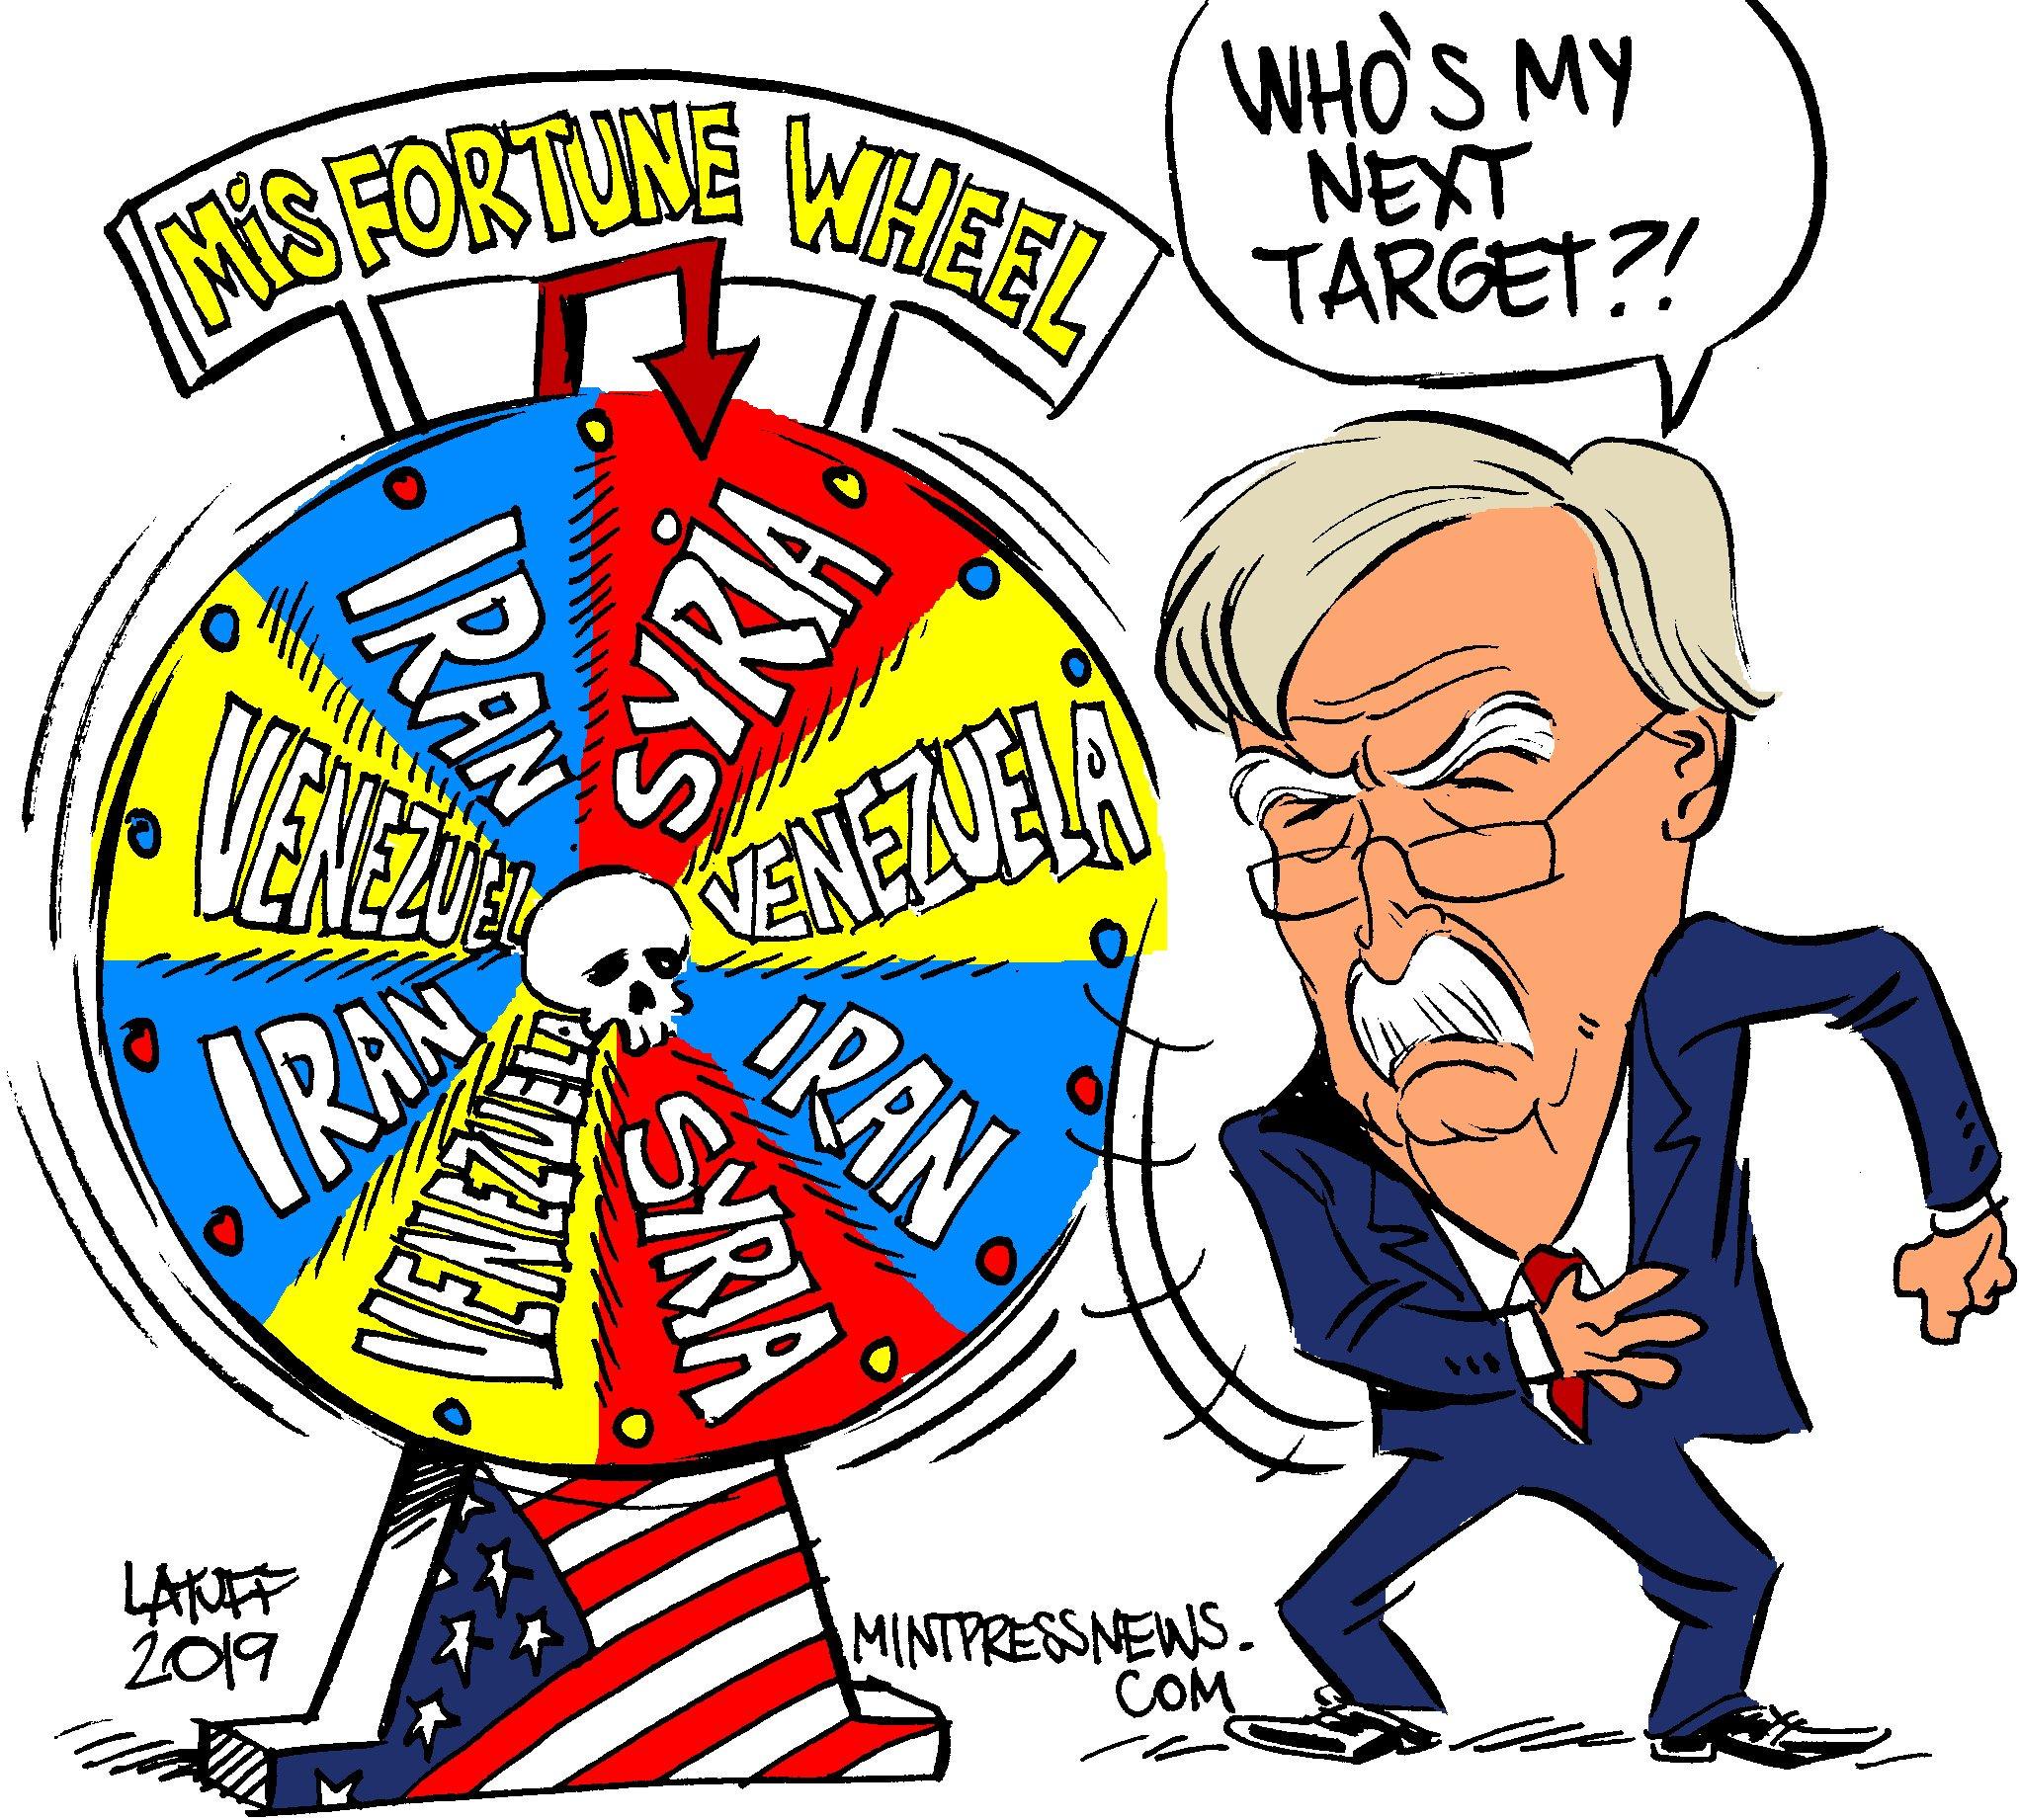 So, who is next?  New cartoon from @LatuffCartoons. https://t.co/oGHXXdsVzK